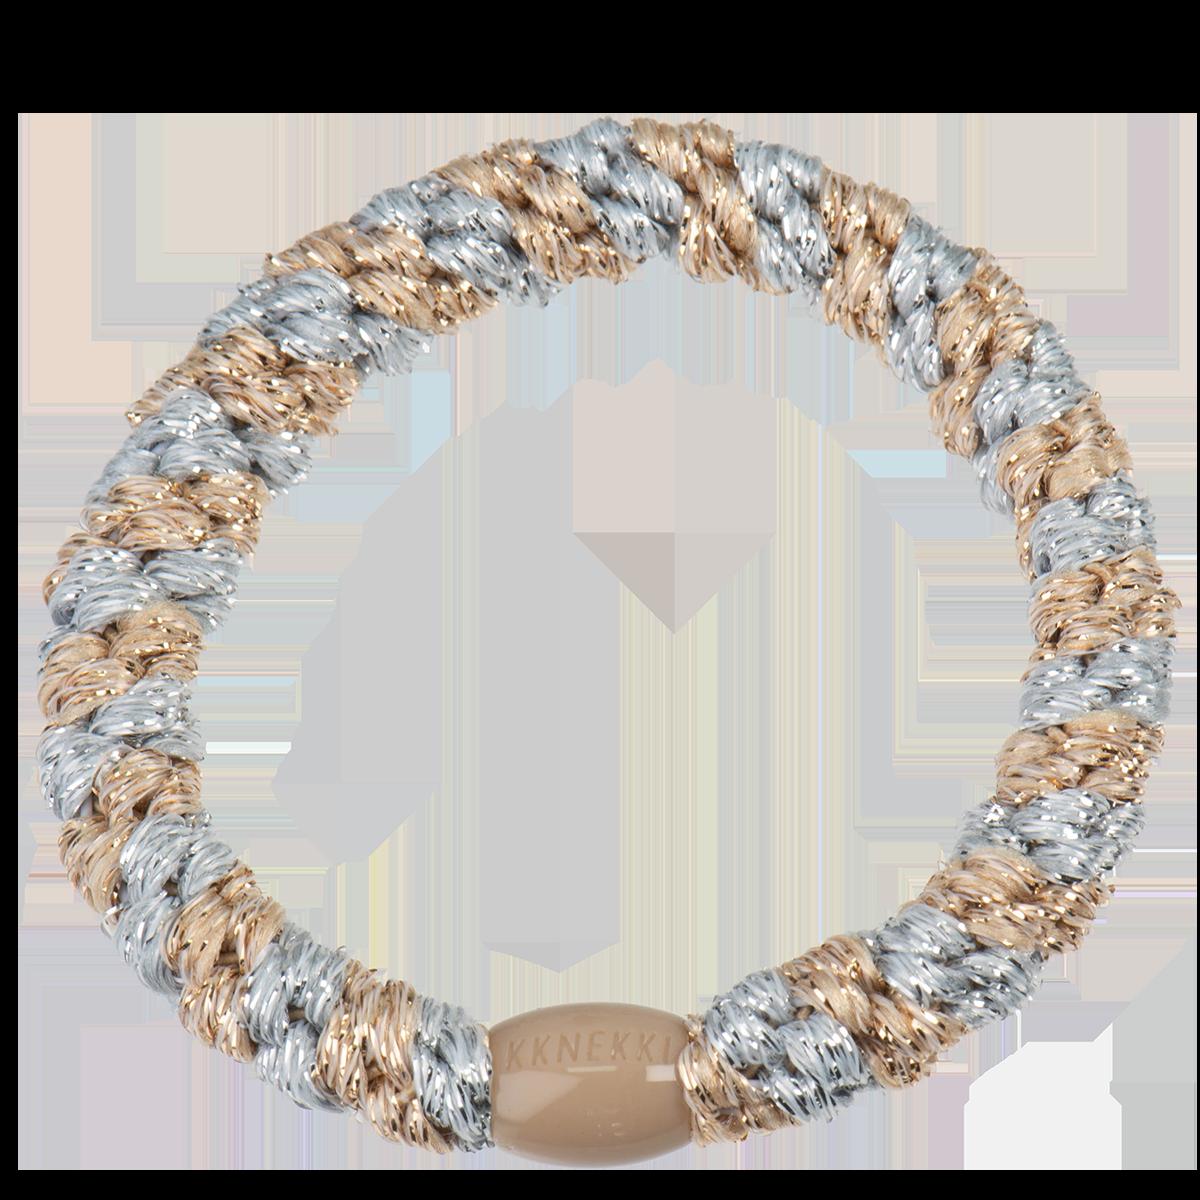 Haargummi / Armband - Silver-beige glitter stripe 5122 - KKNEKKI